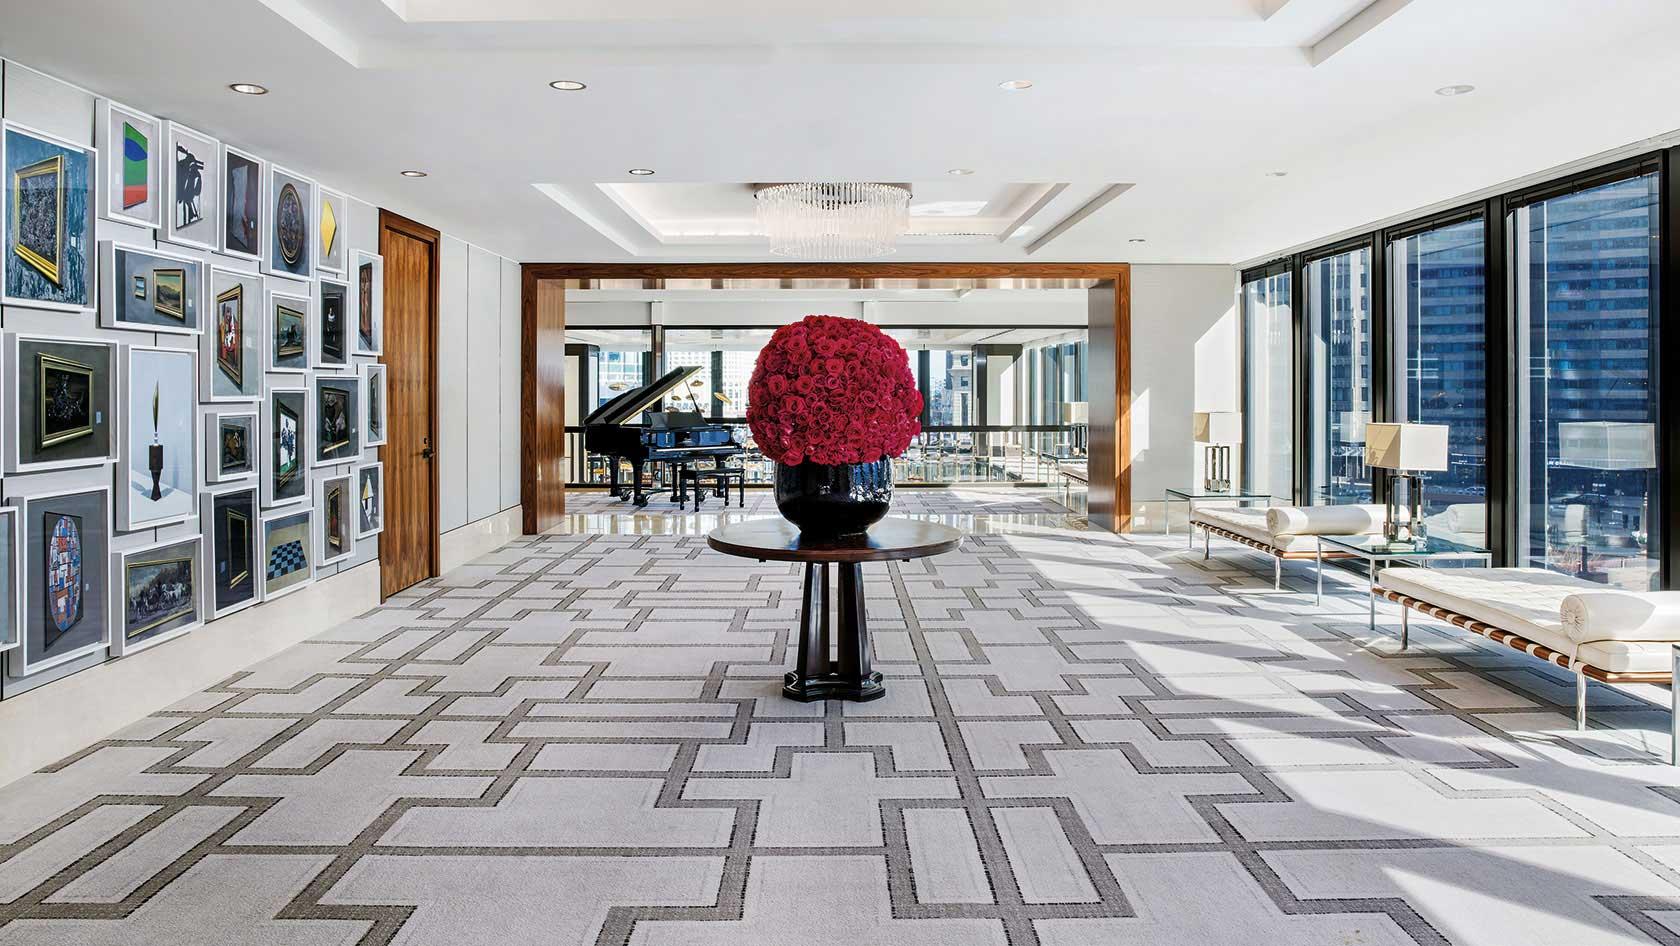 Devonshire ballroom pre-function area